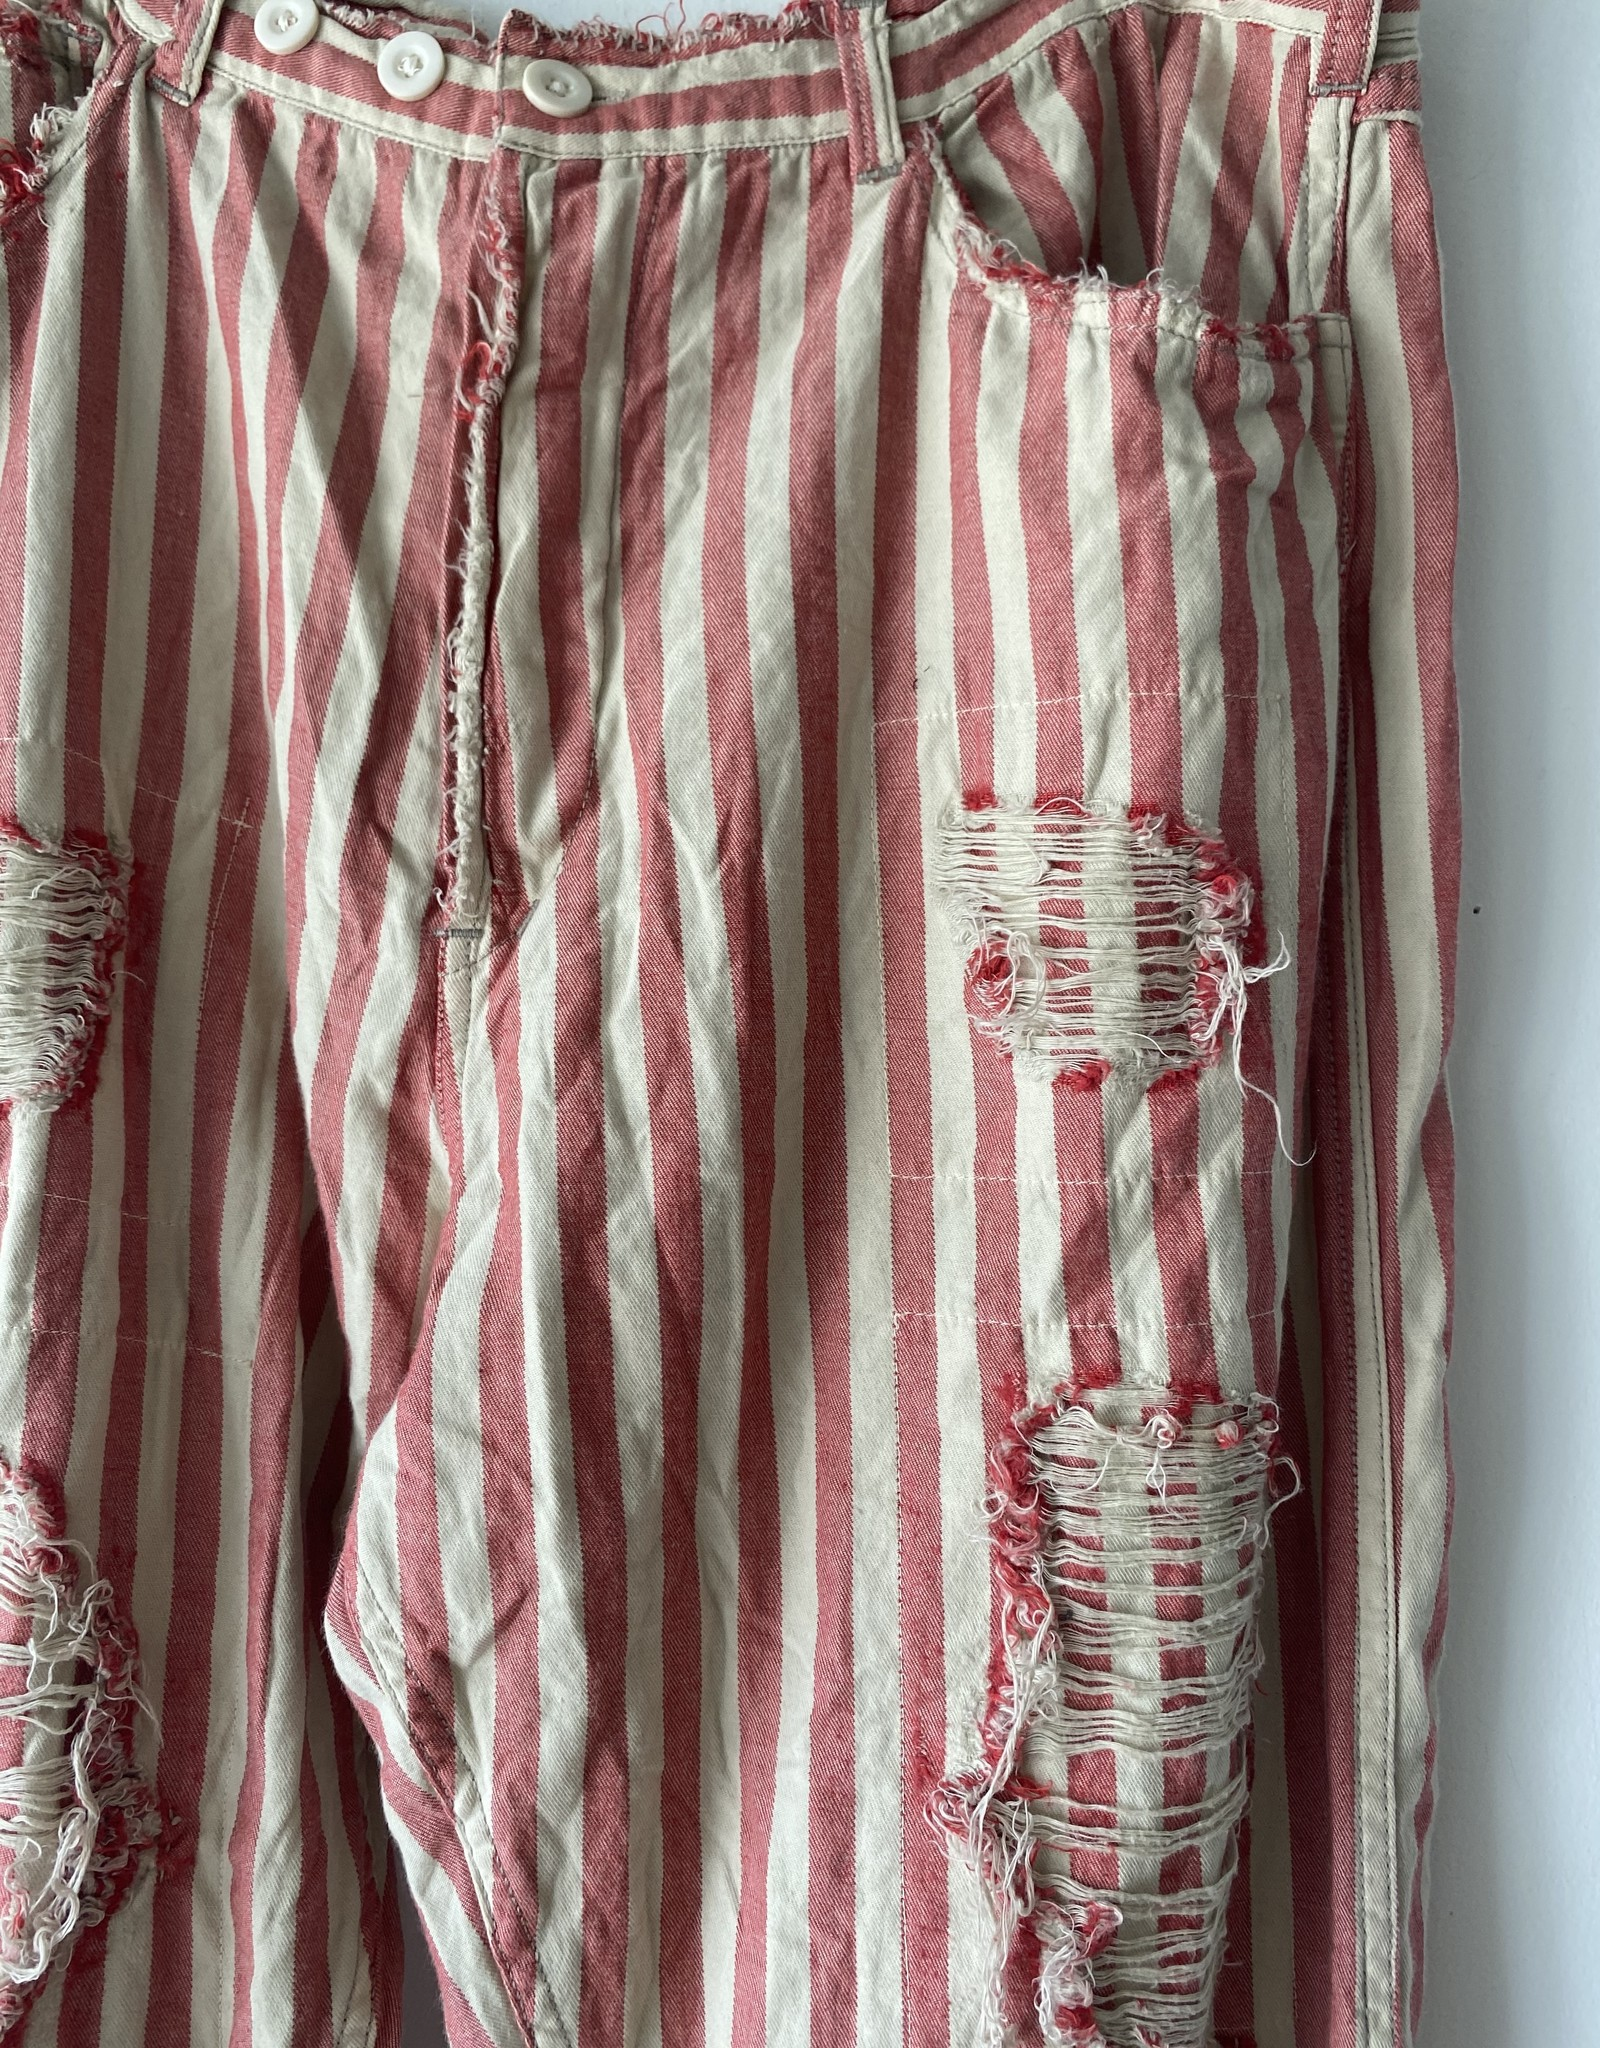 MAGNOLIA PEARL MAGNOLIA PEARL PANTS 195